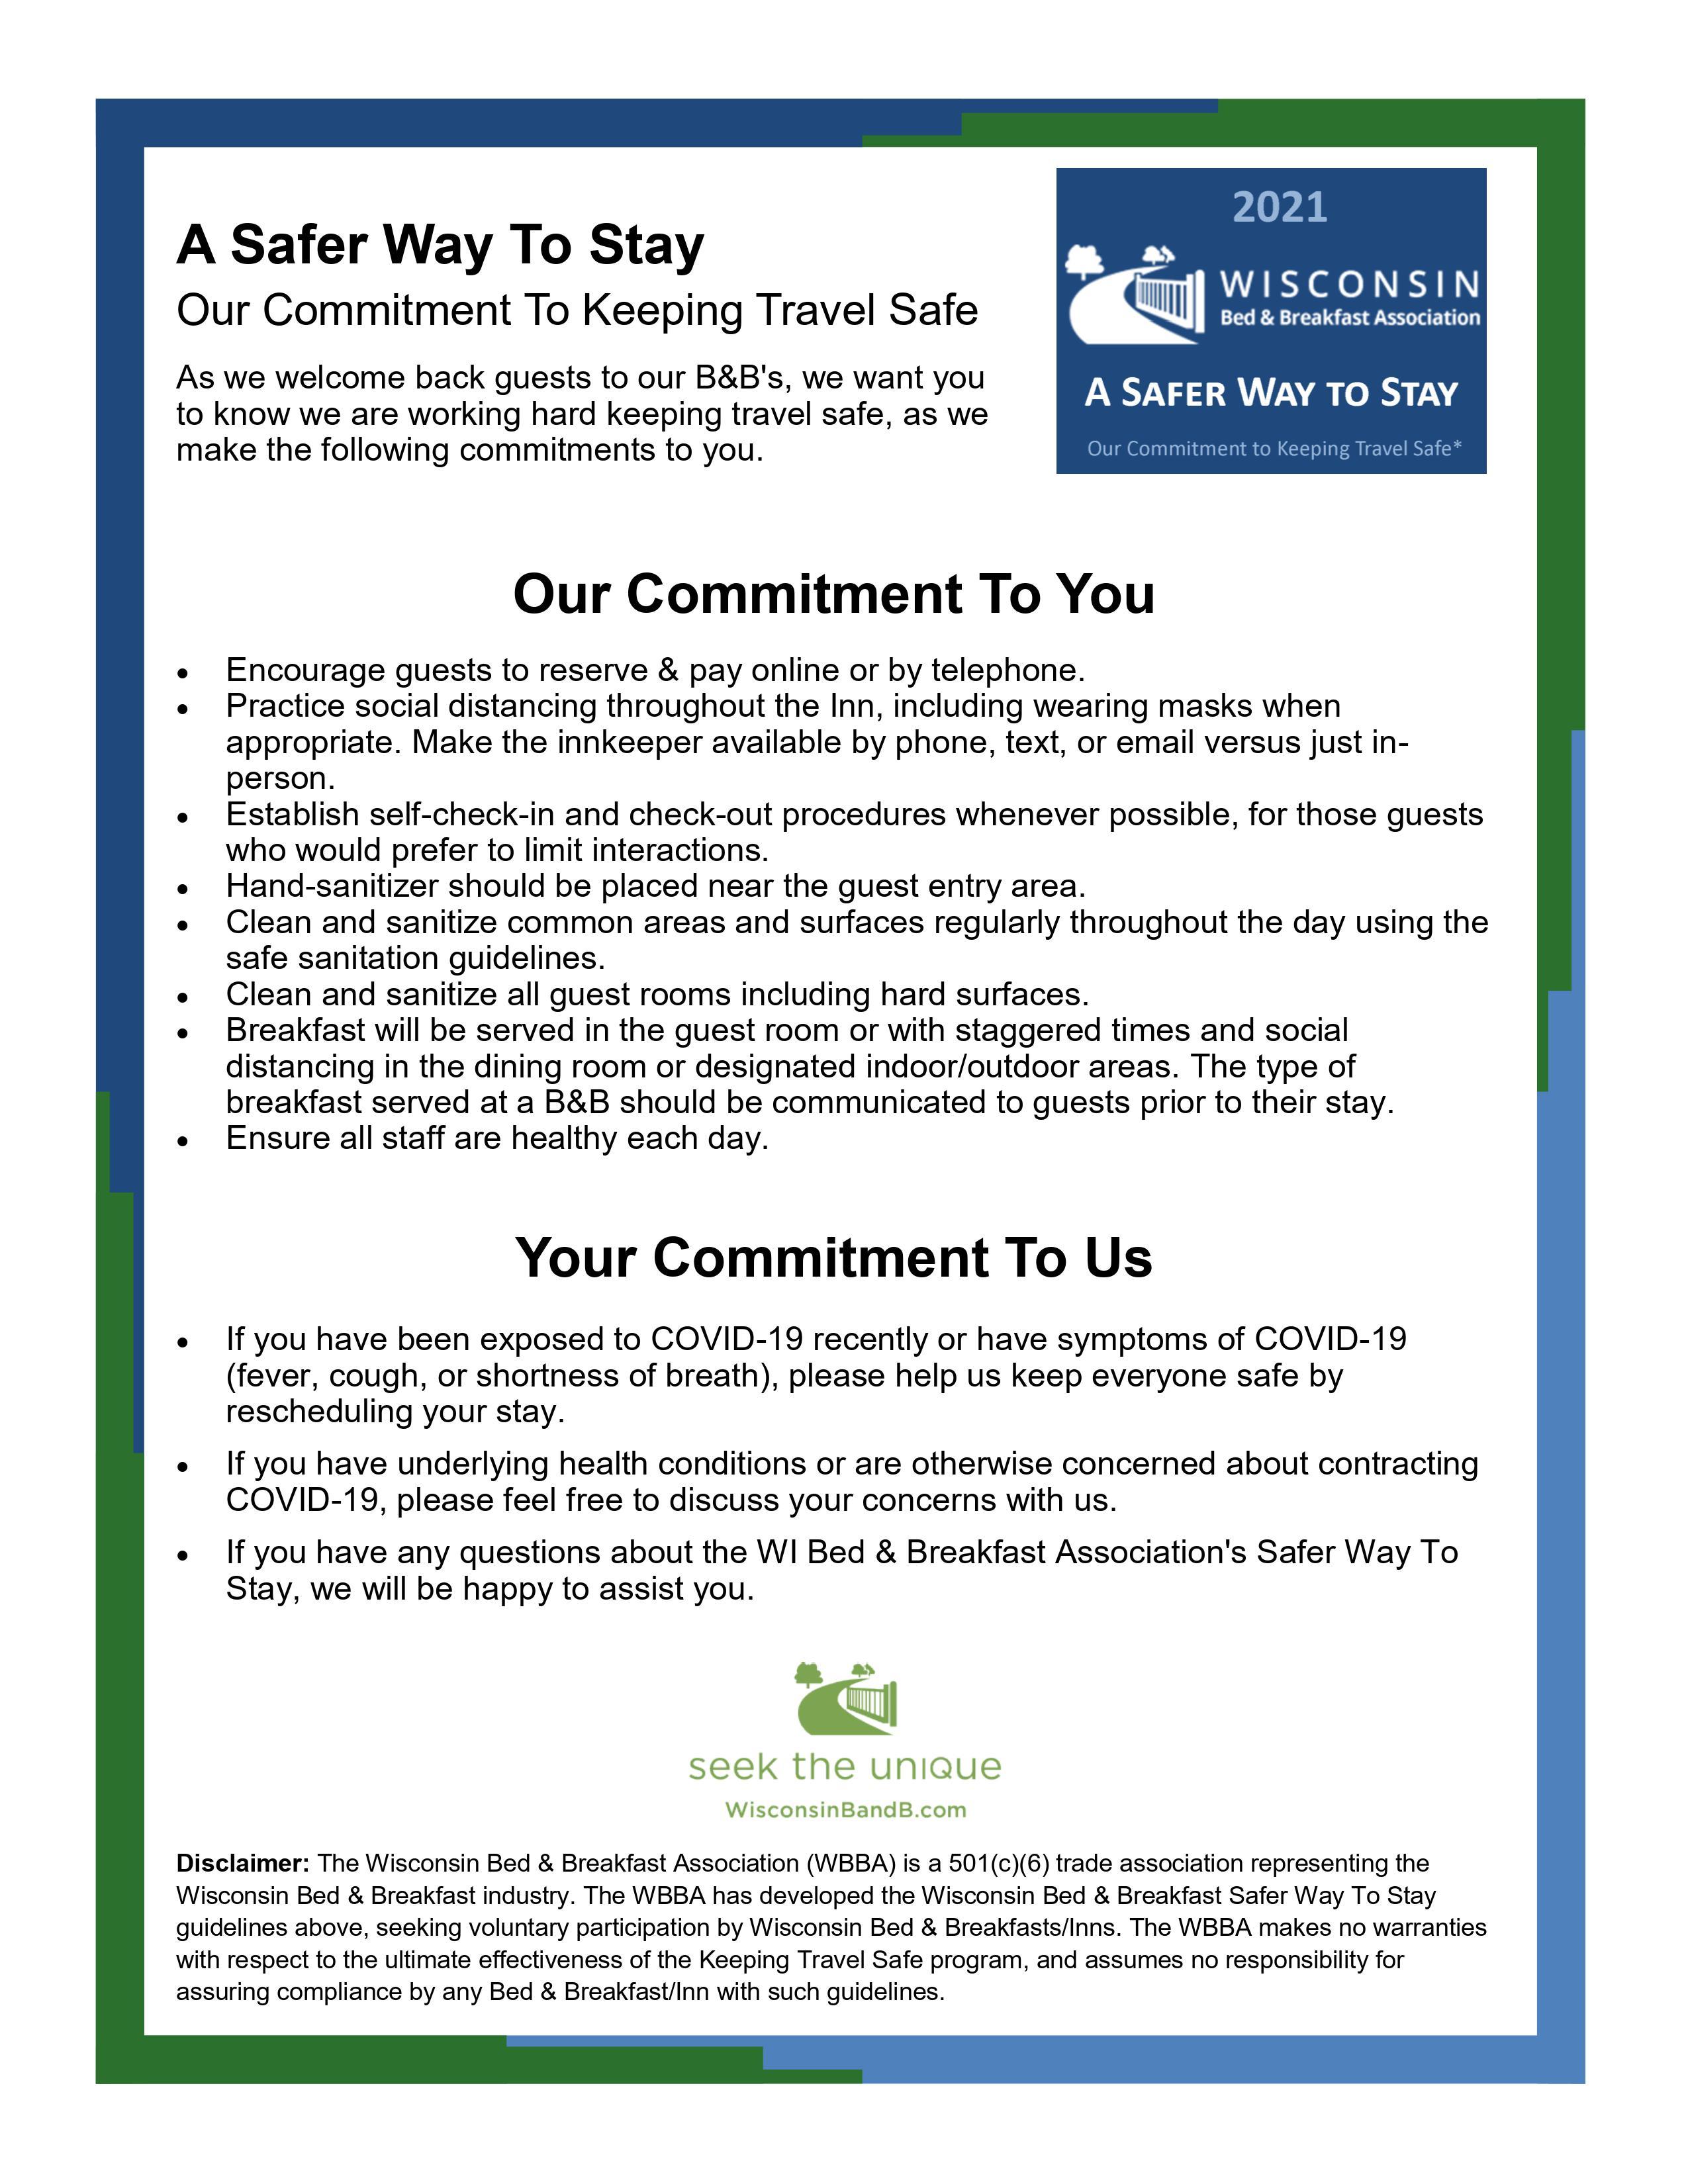 Keeping Travel Safe Document